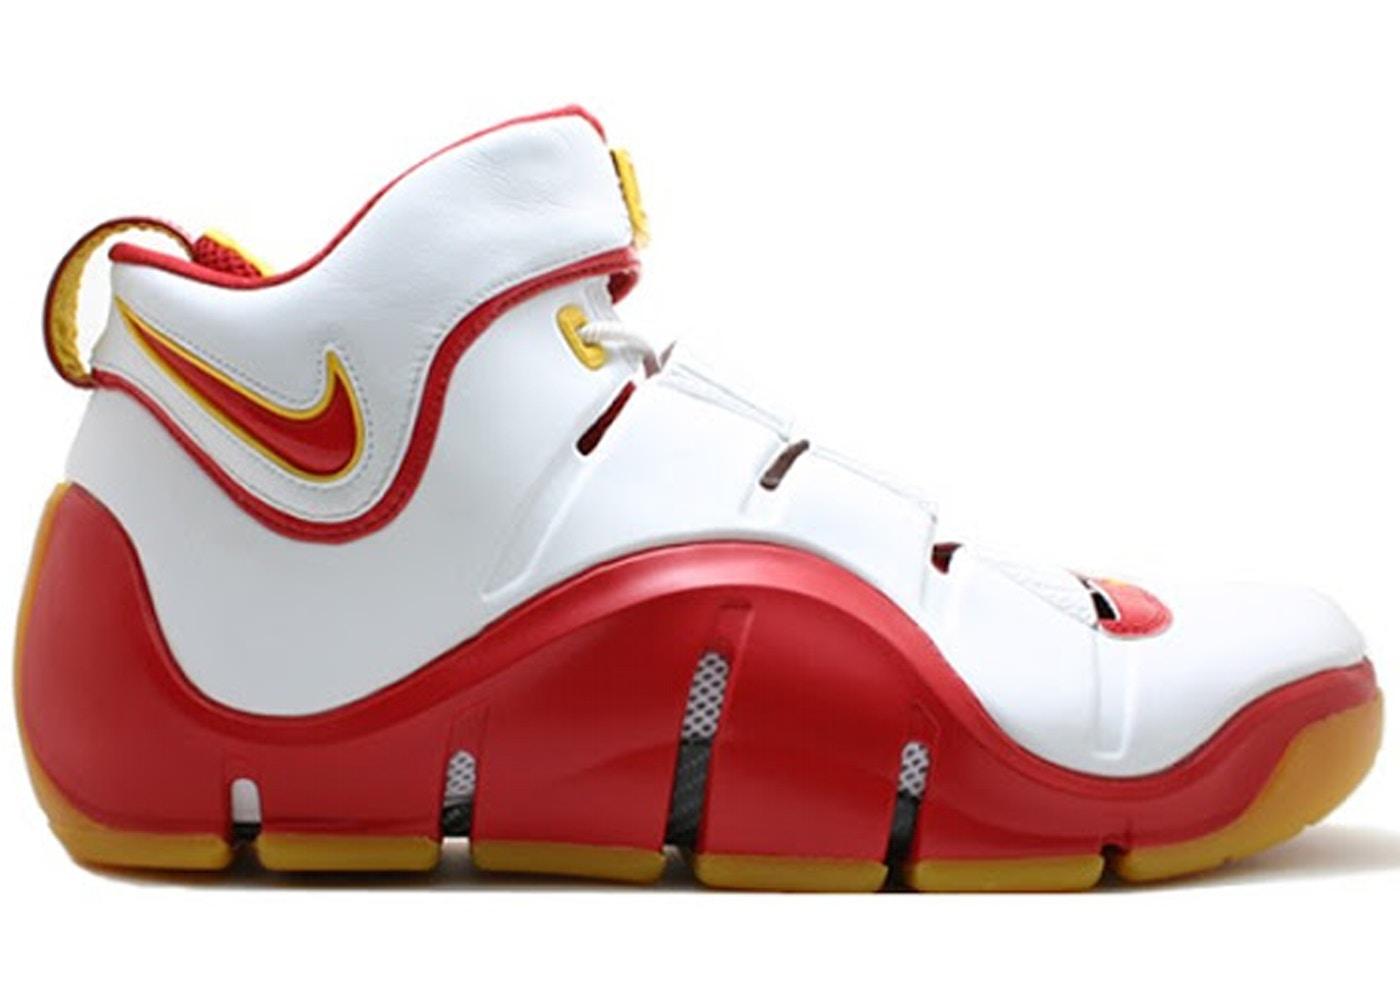 42bf102fefa Buy Nike LeBron 4 Shoes   Deadstock Sneakers